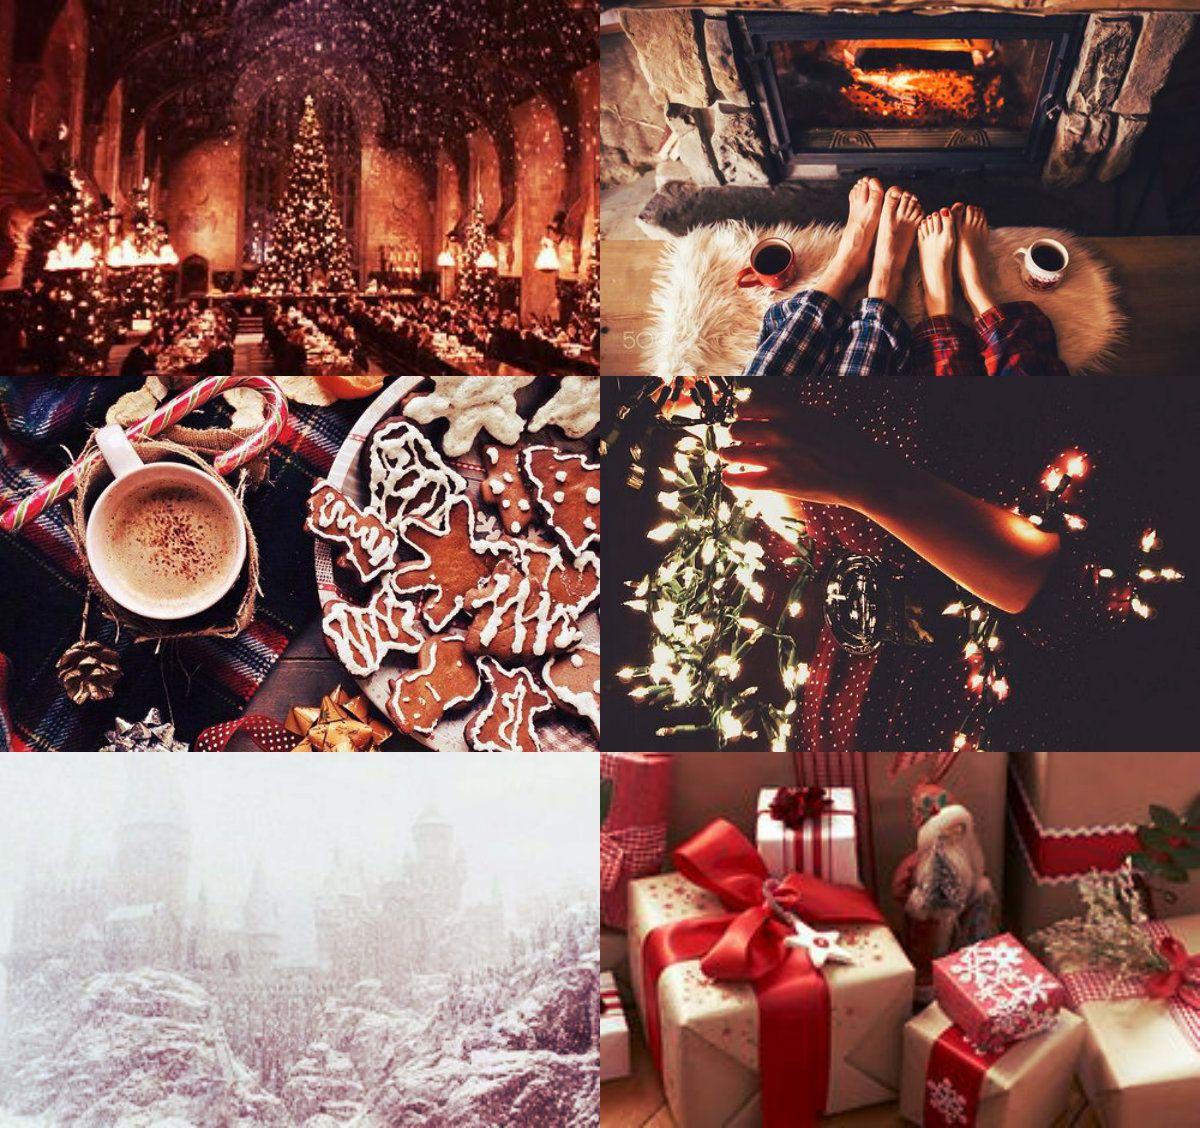 Christmas Wallpaper Aesthetic: Harry Potter Aesthetics: Gryffindor Winter/christmas 2/2